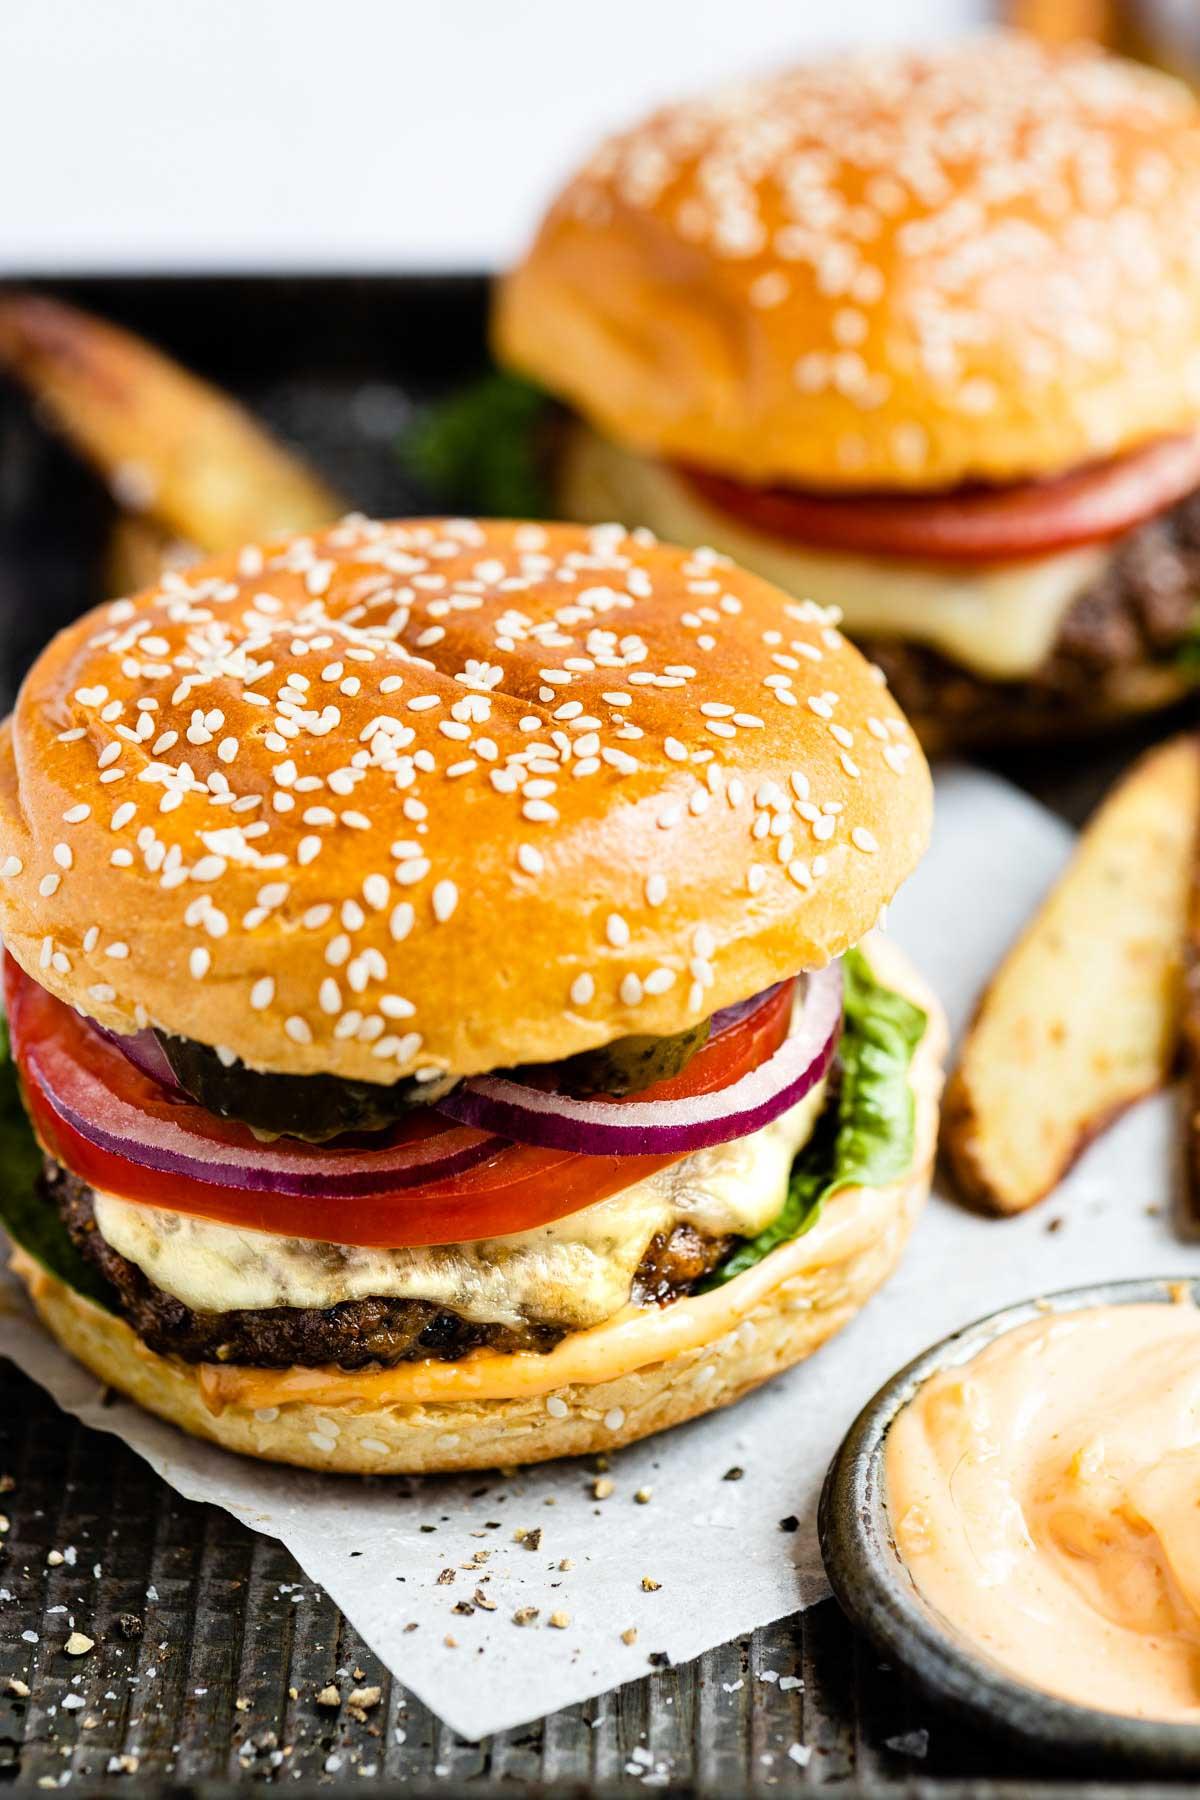 Ground Venison ; Pork Burger